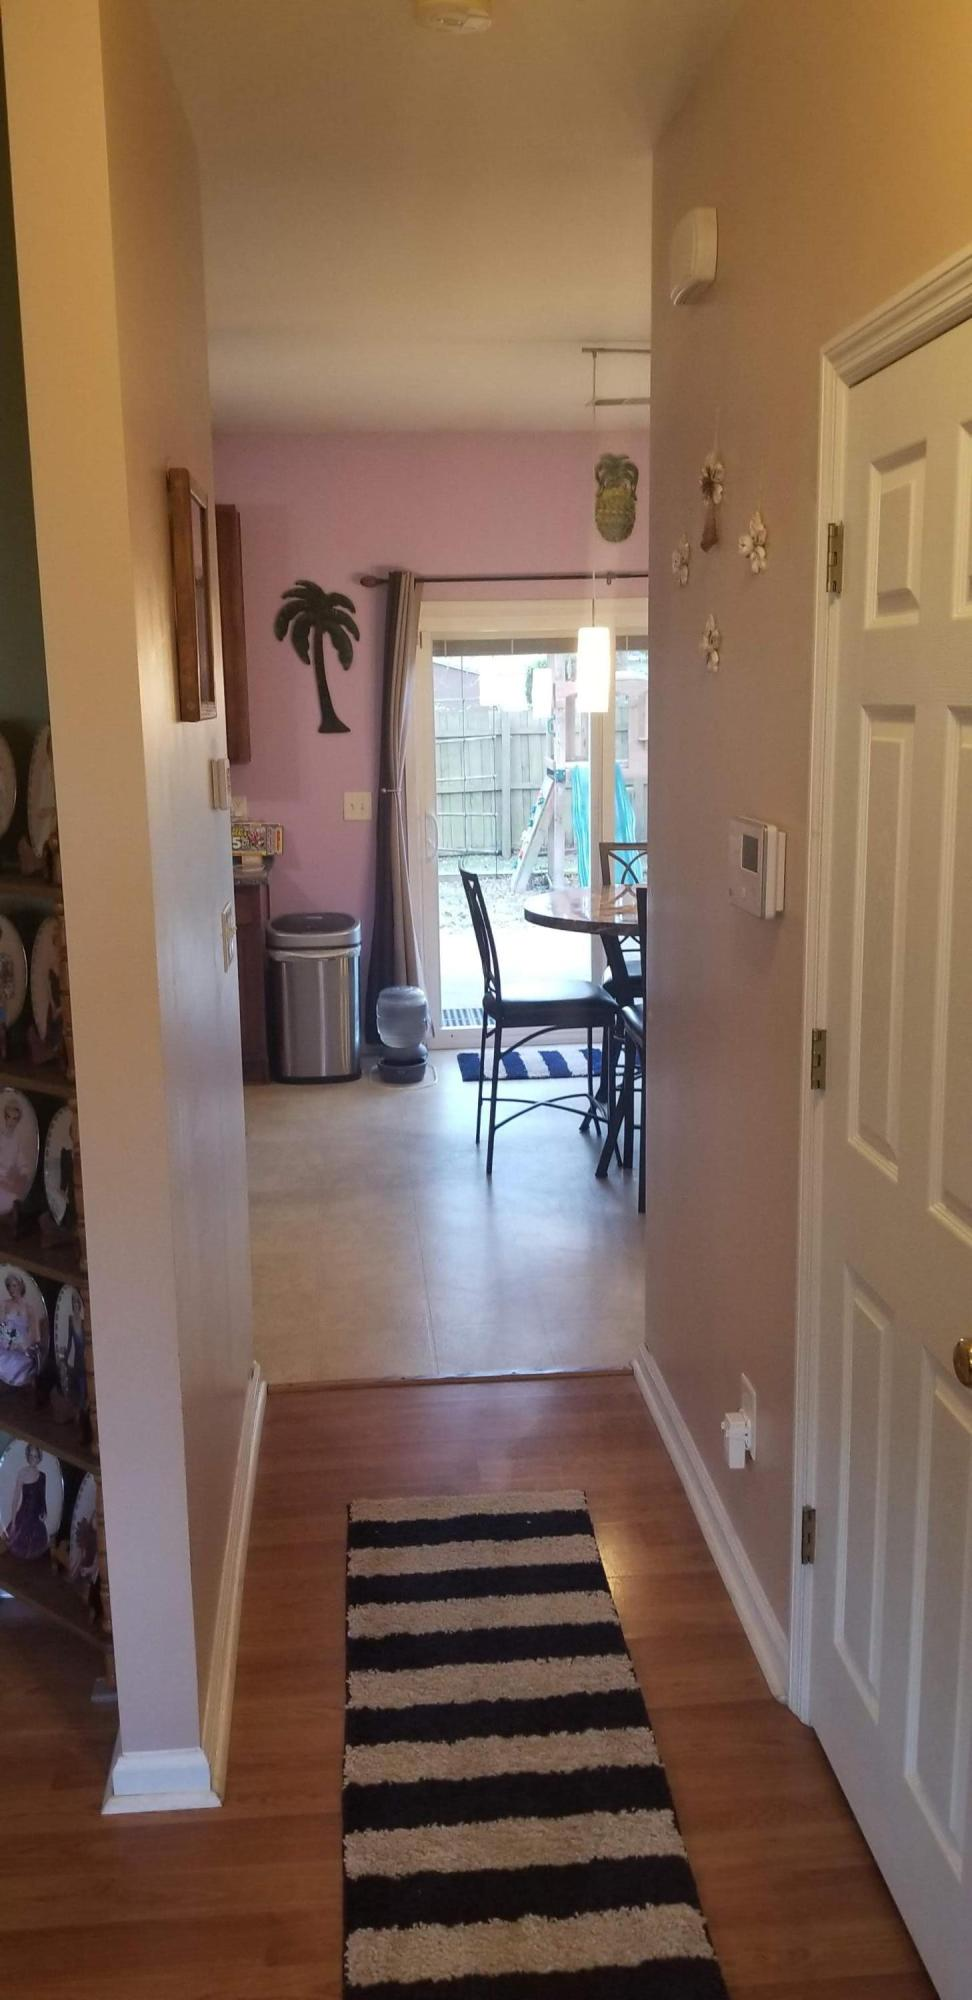 Colony North II Homes For Sale - 2987 Nantuckett, North Charleston, SC - 12